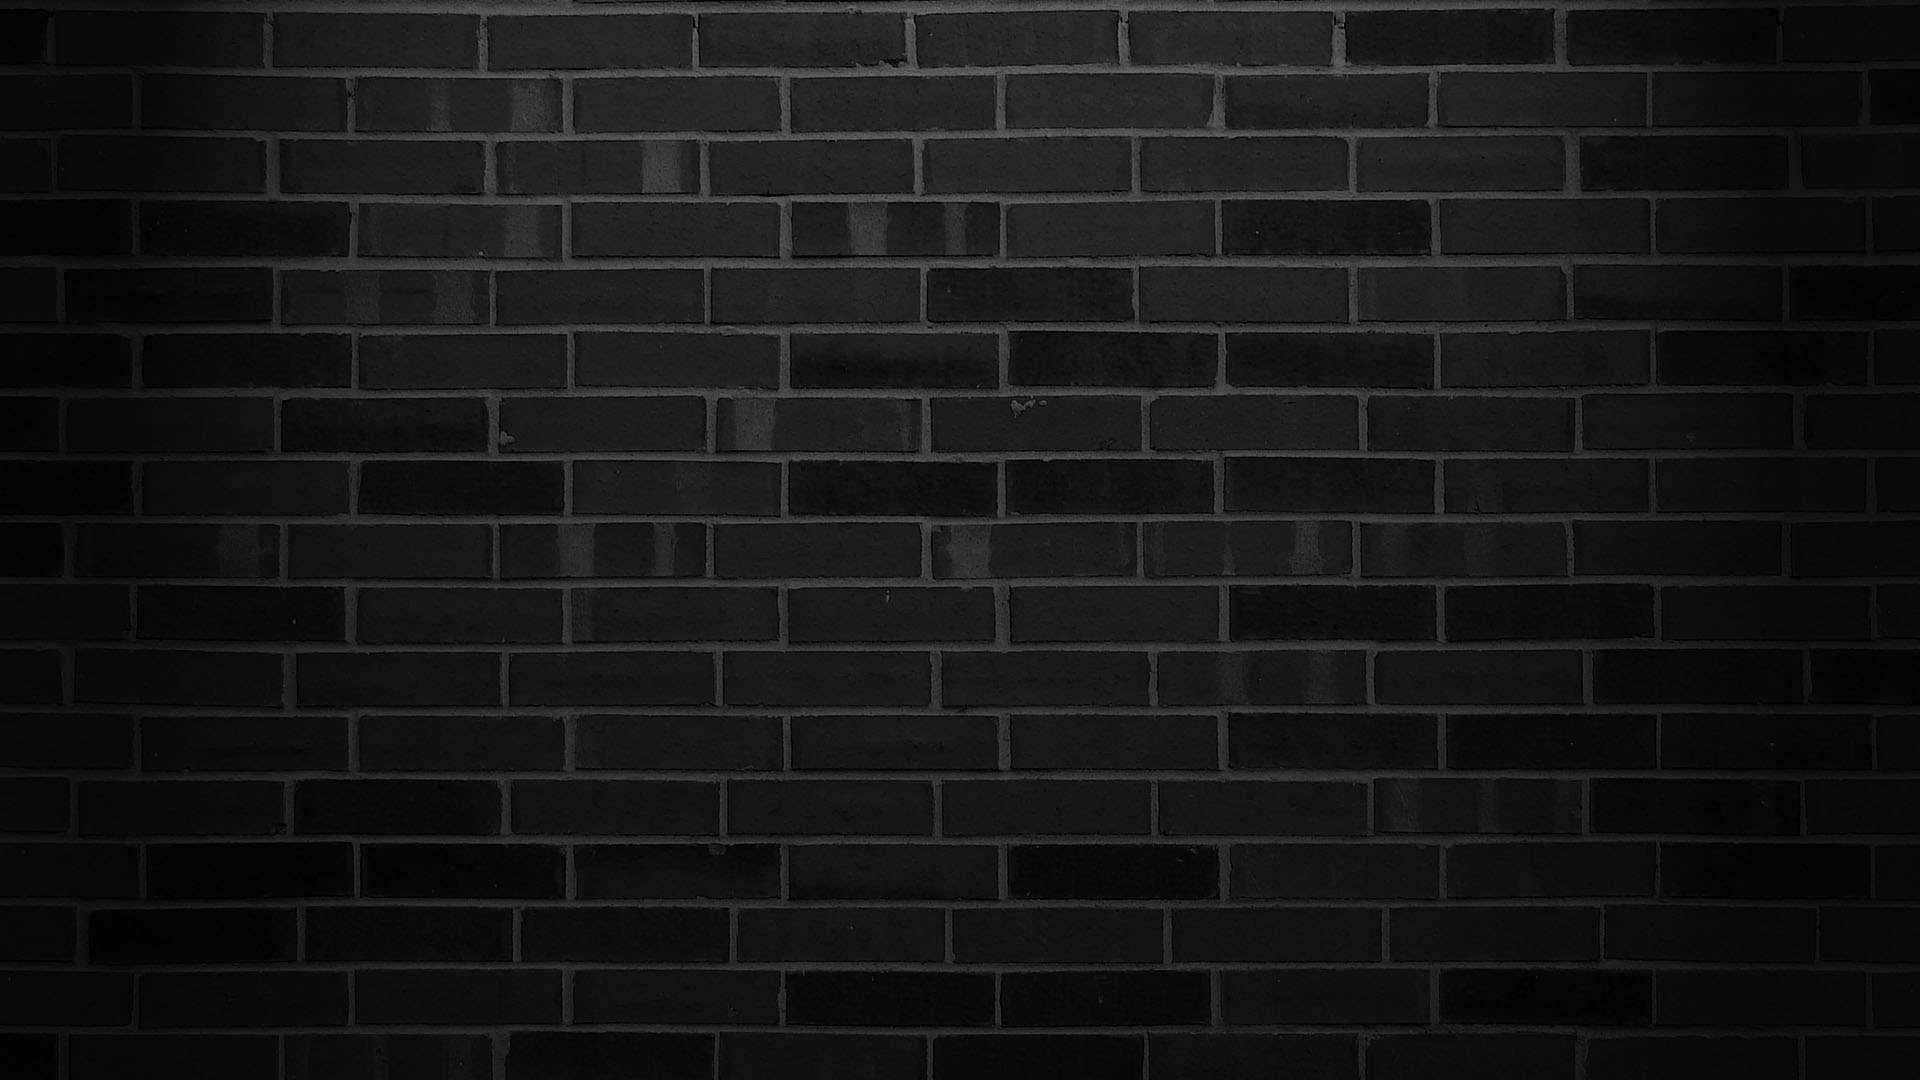 Pattern Wallpaper 036